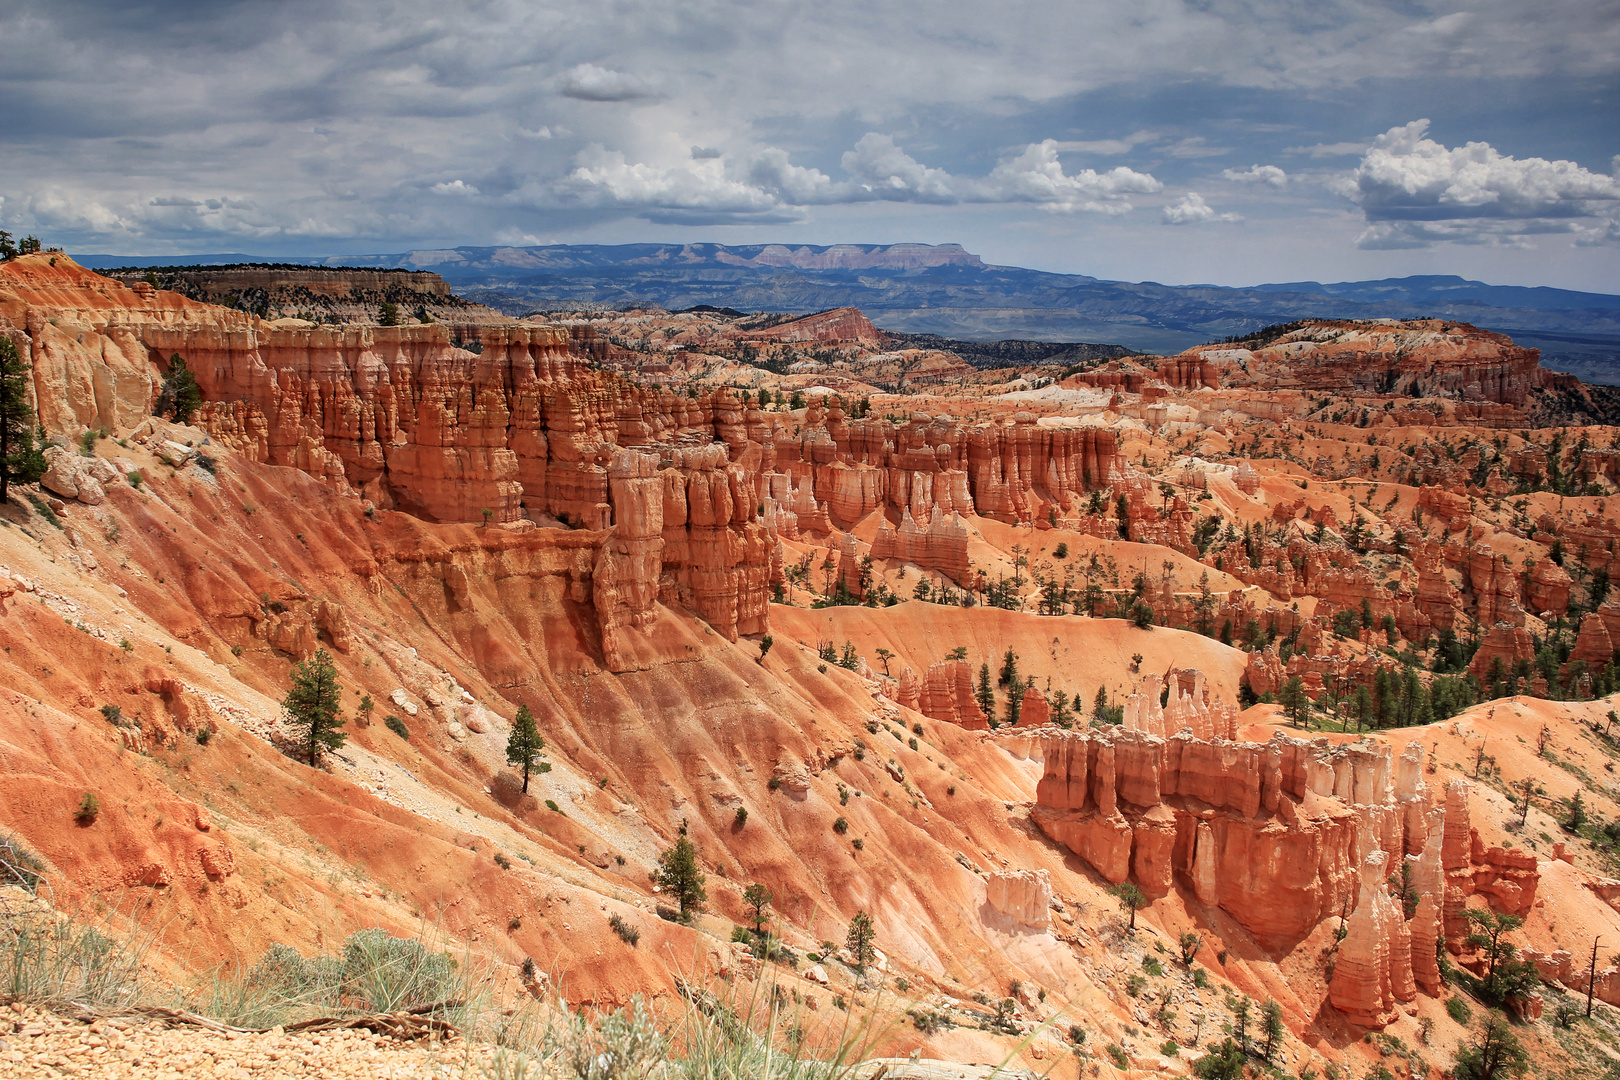 Erosionsformen des Bryce Canyon